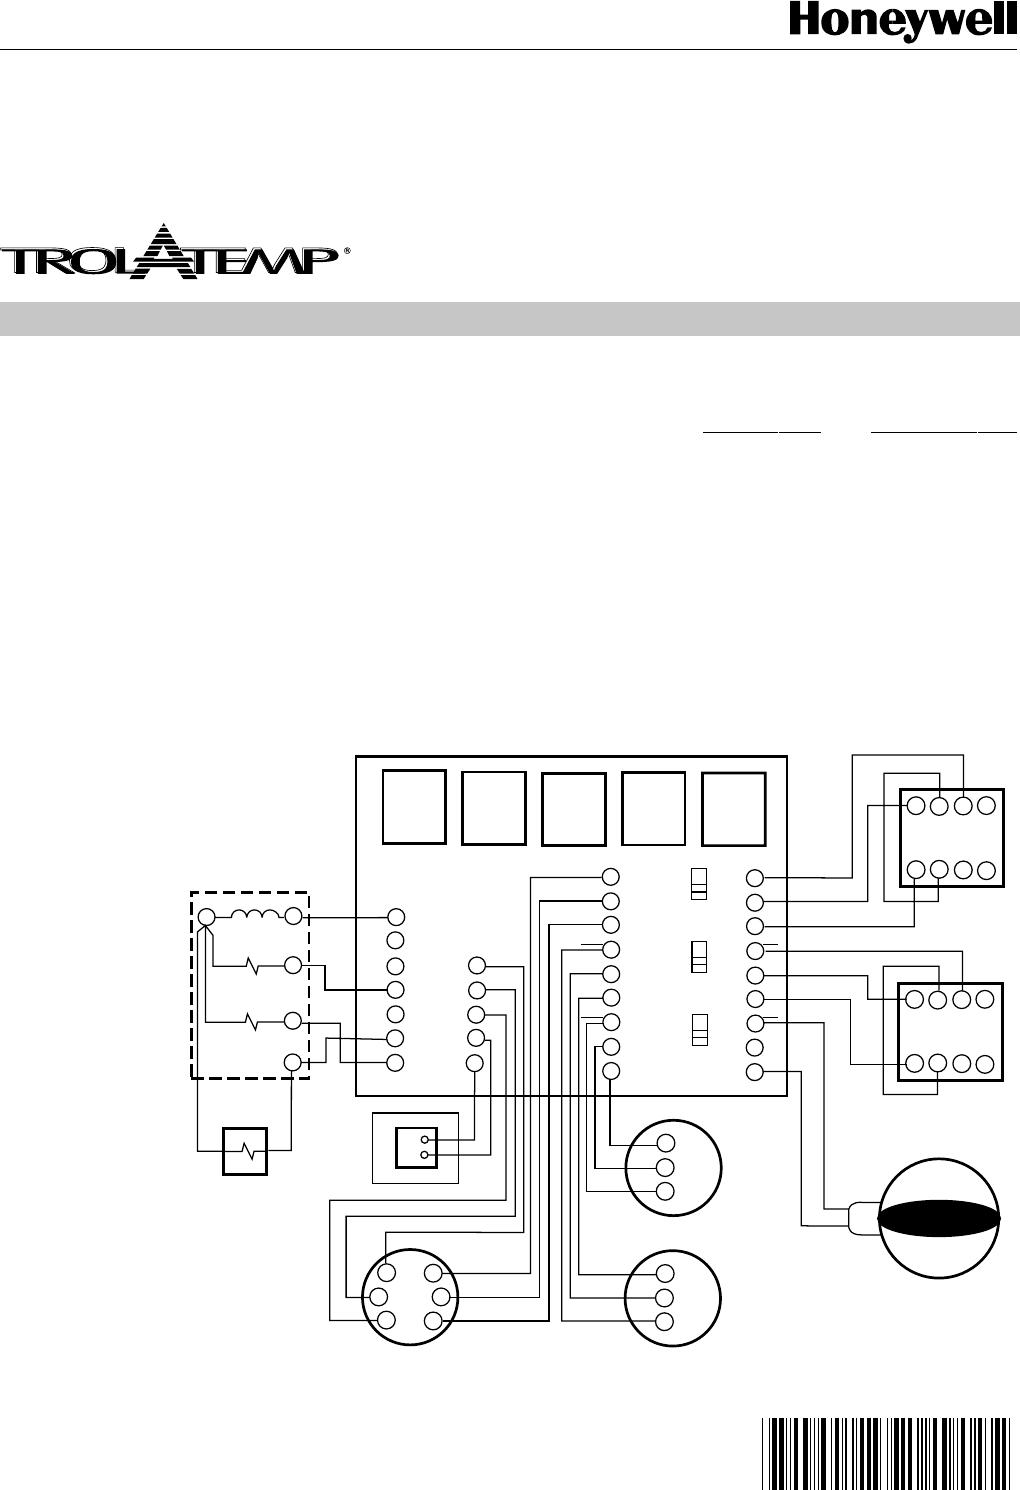 Honeywell Mm3 Mastertrol Mm 3 Users Manual 69 1362